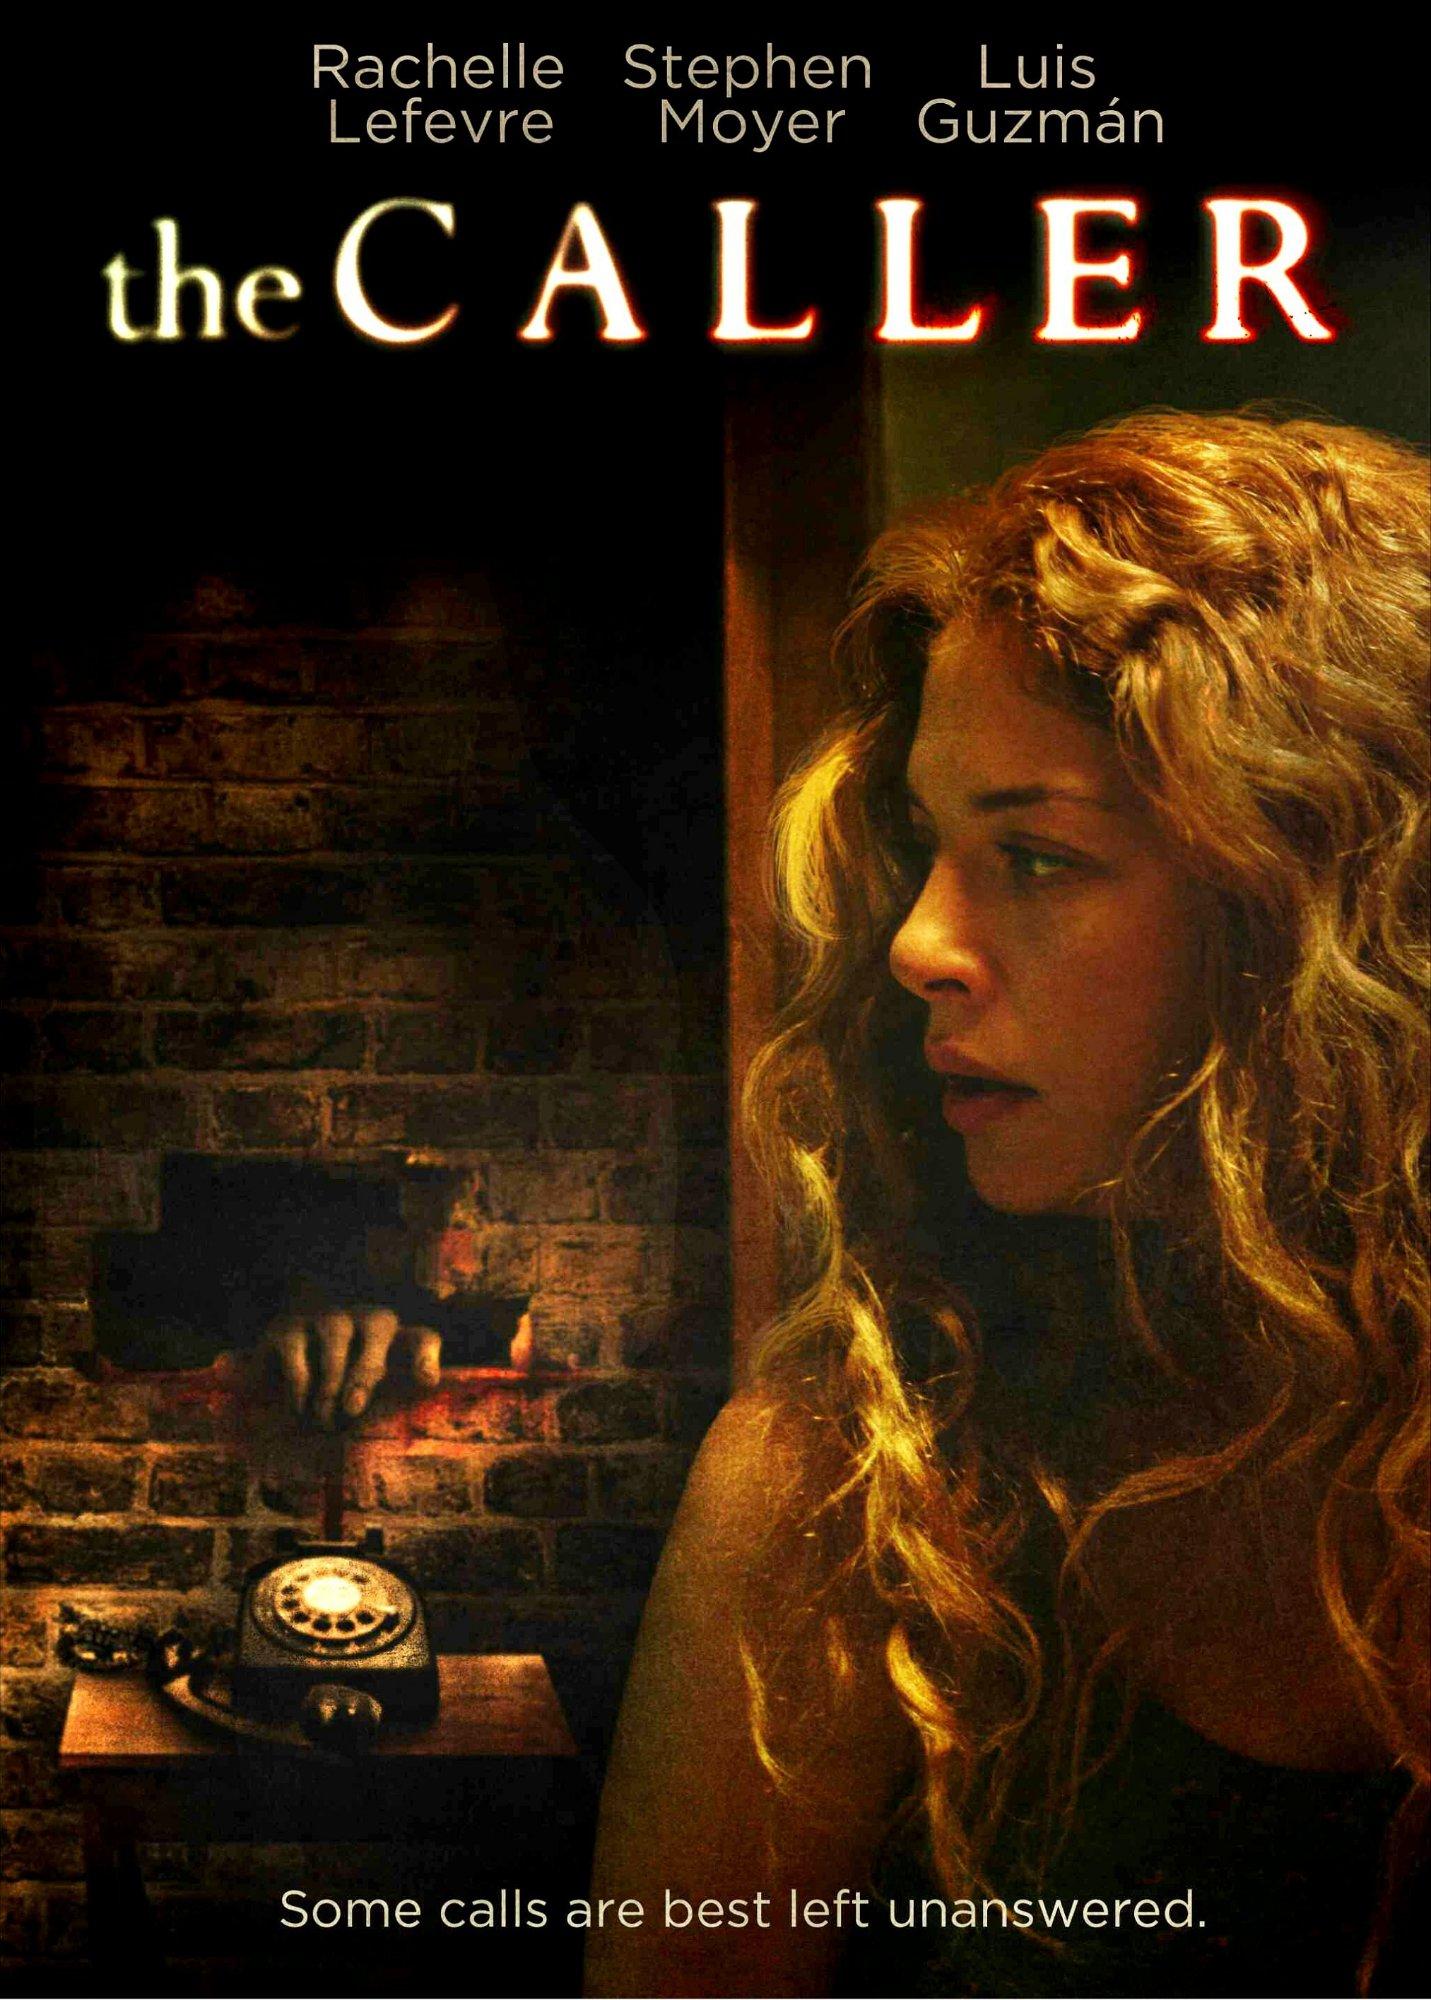 thecaller.jpg